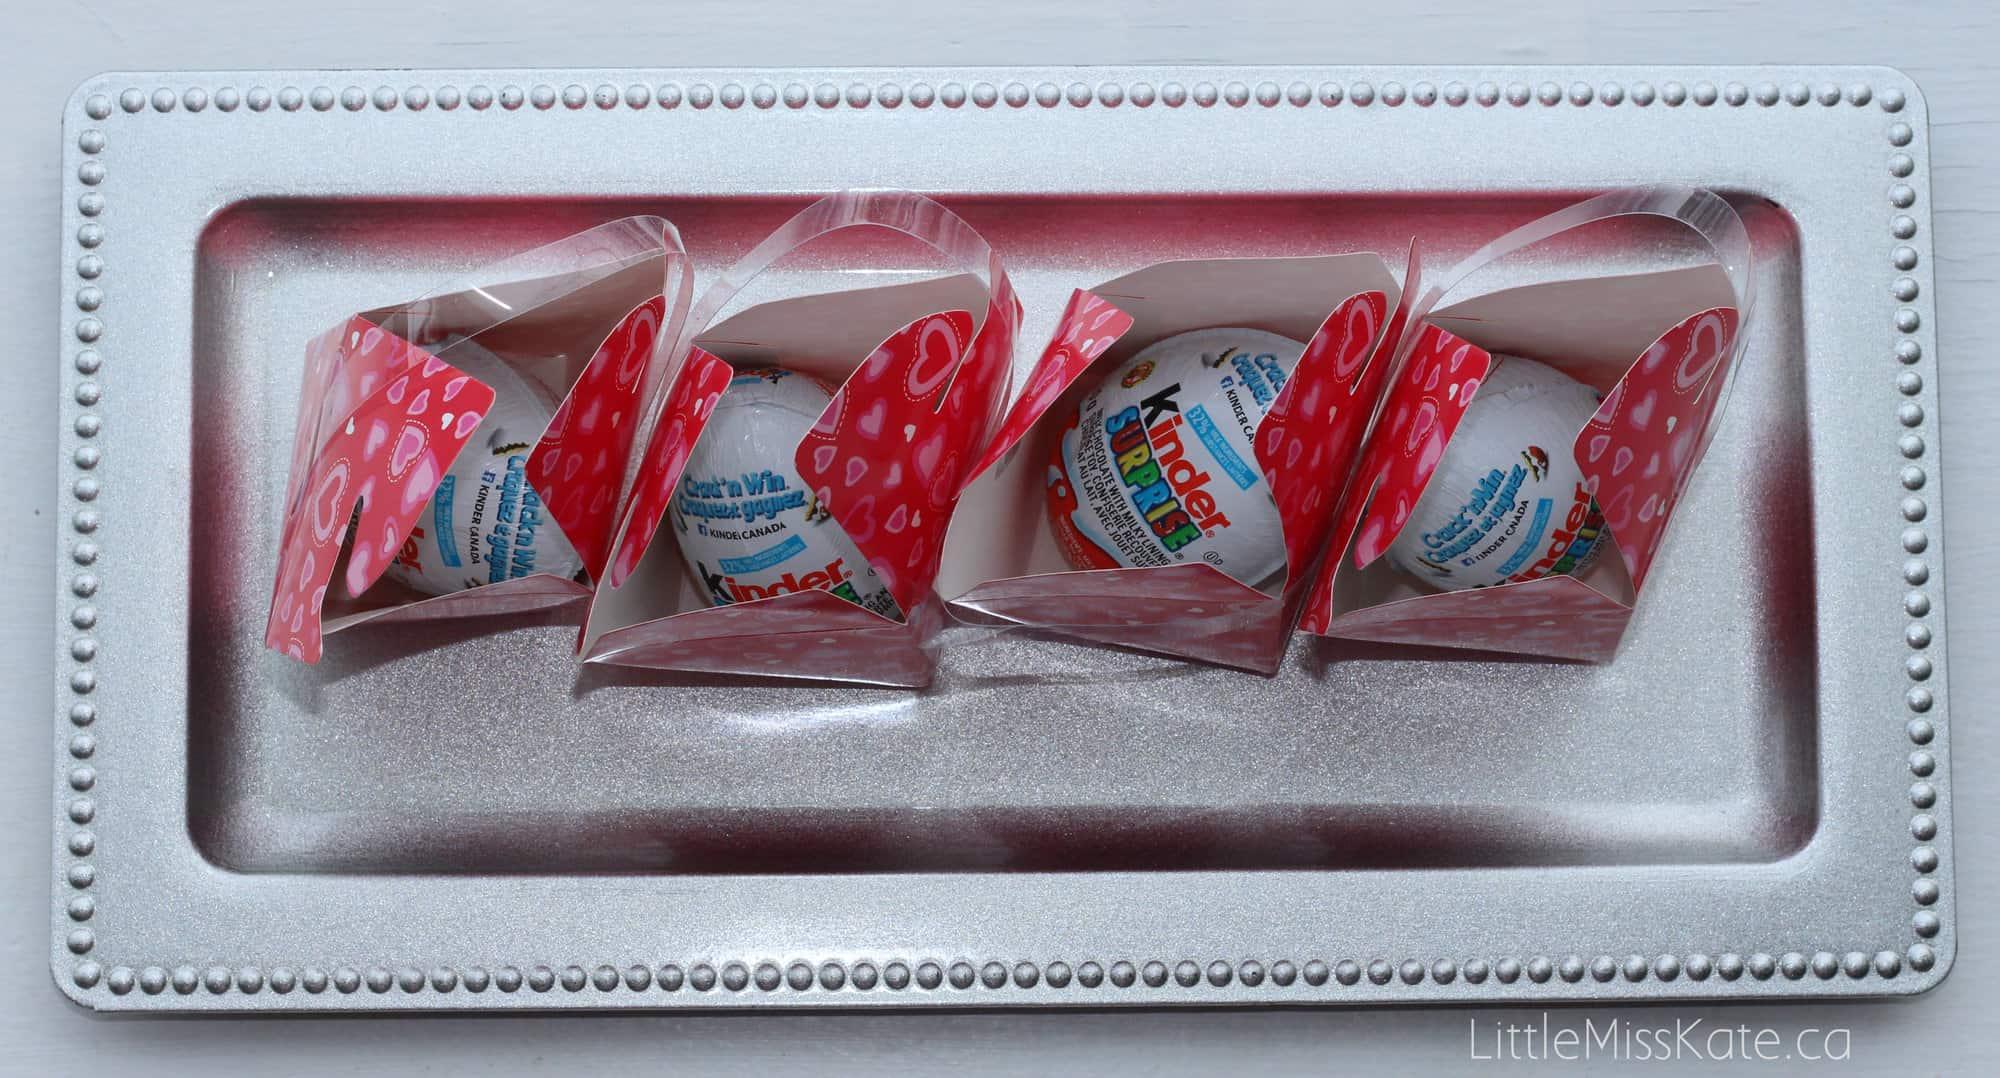 DIY Kinder Surprise Egg Valentines with Free Printable via LittleMissKate.ca